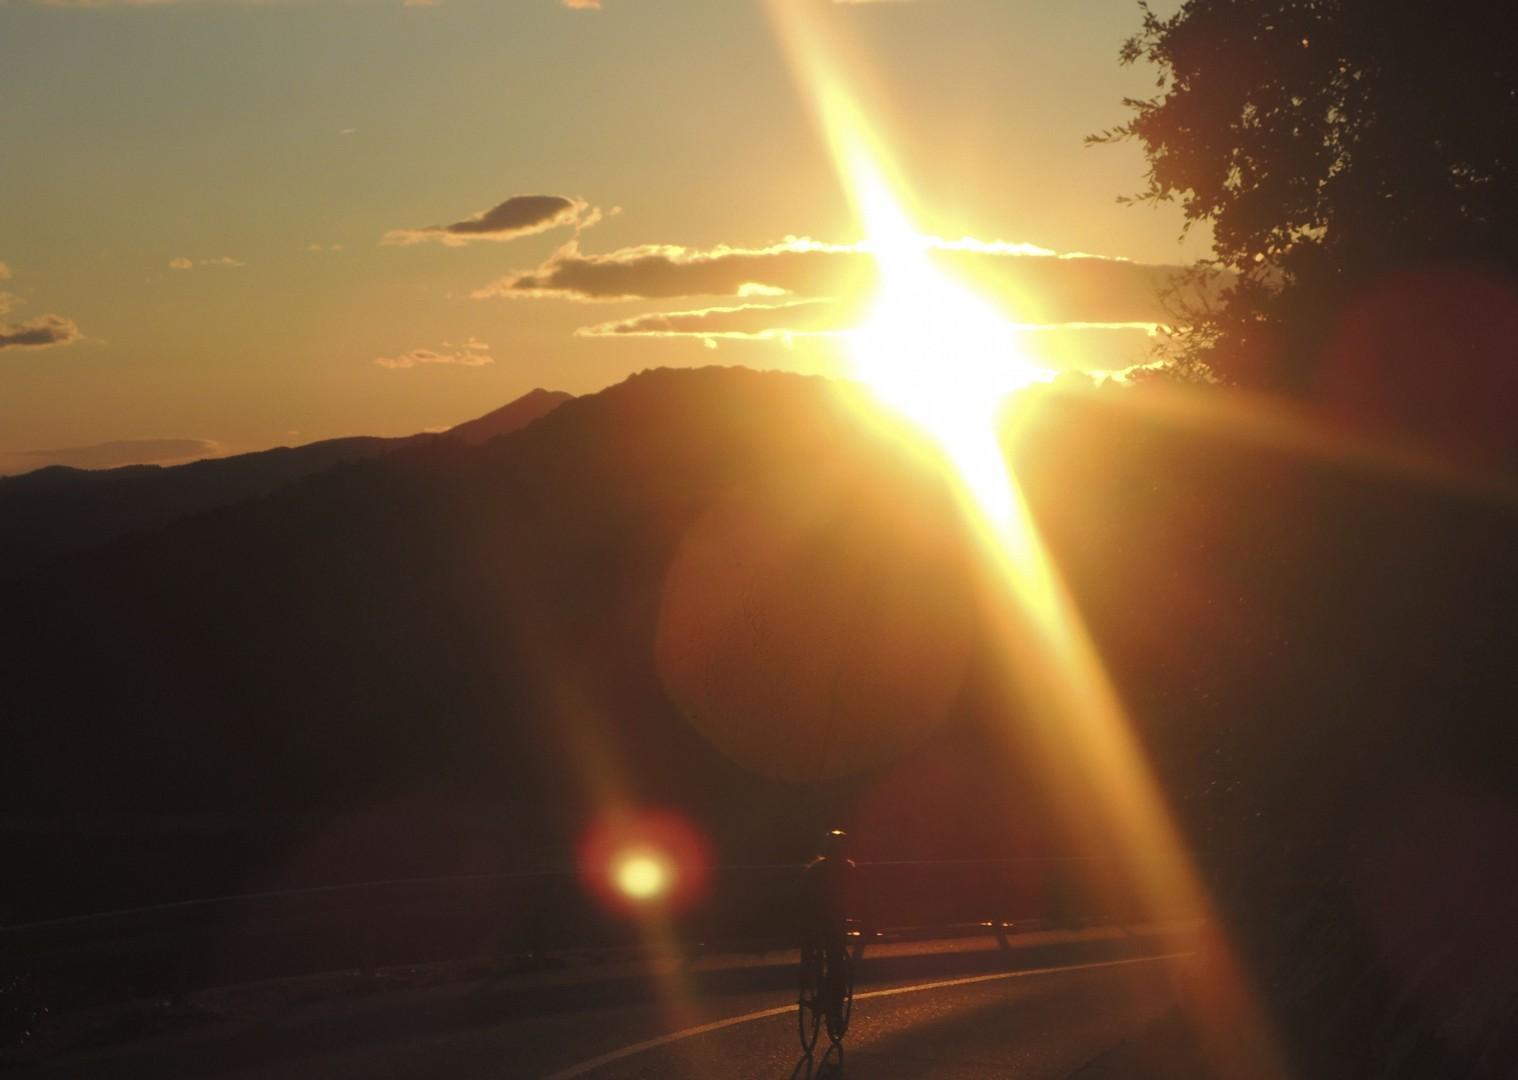 croatiaroad4.jpg - Slovenia and Croatia - Slovenian Alps to Dalmatian Coast - Guided Road Cycling Holiday - Road Cycling